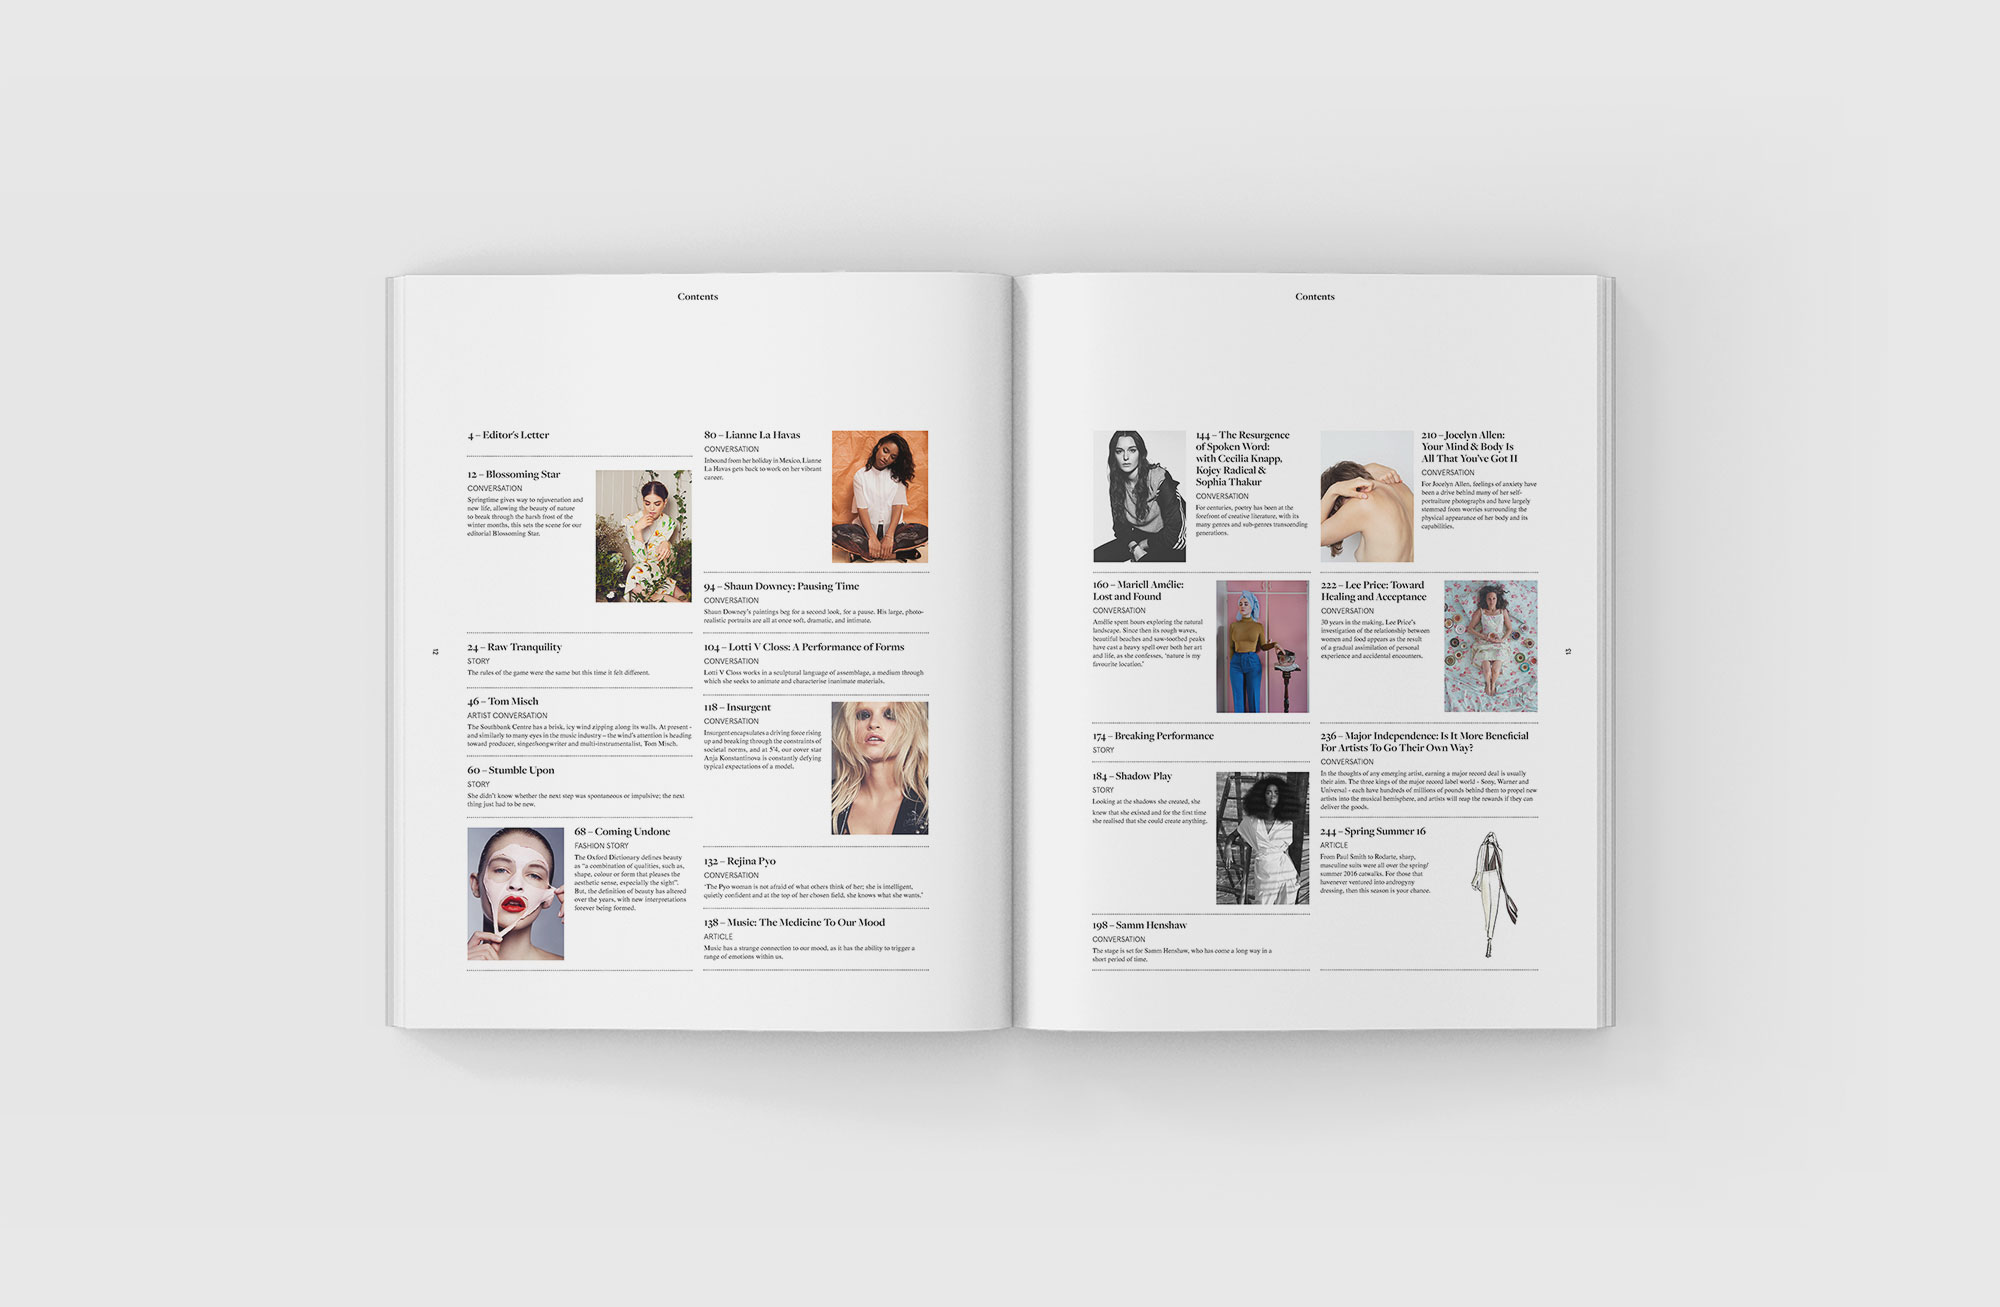 jungle-magazine-01-5.jpg